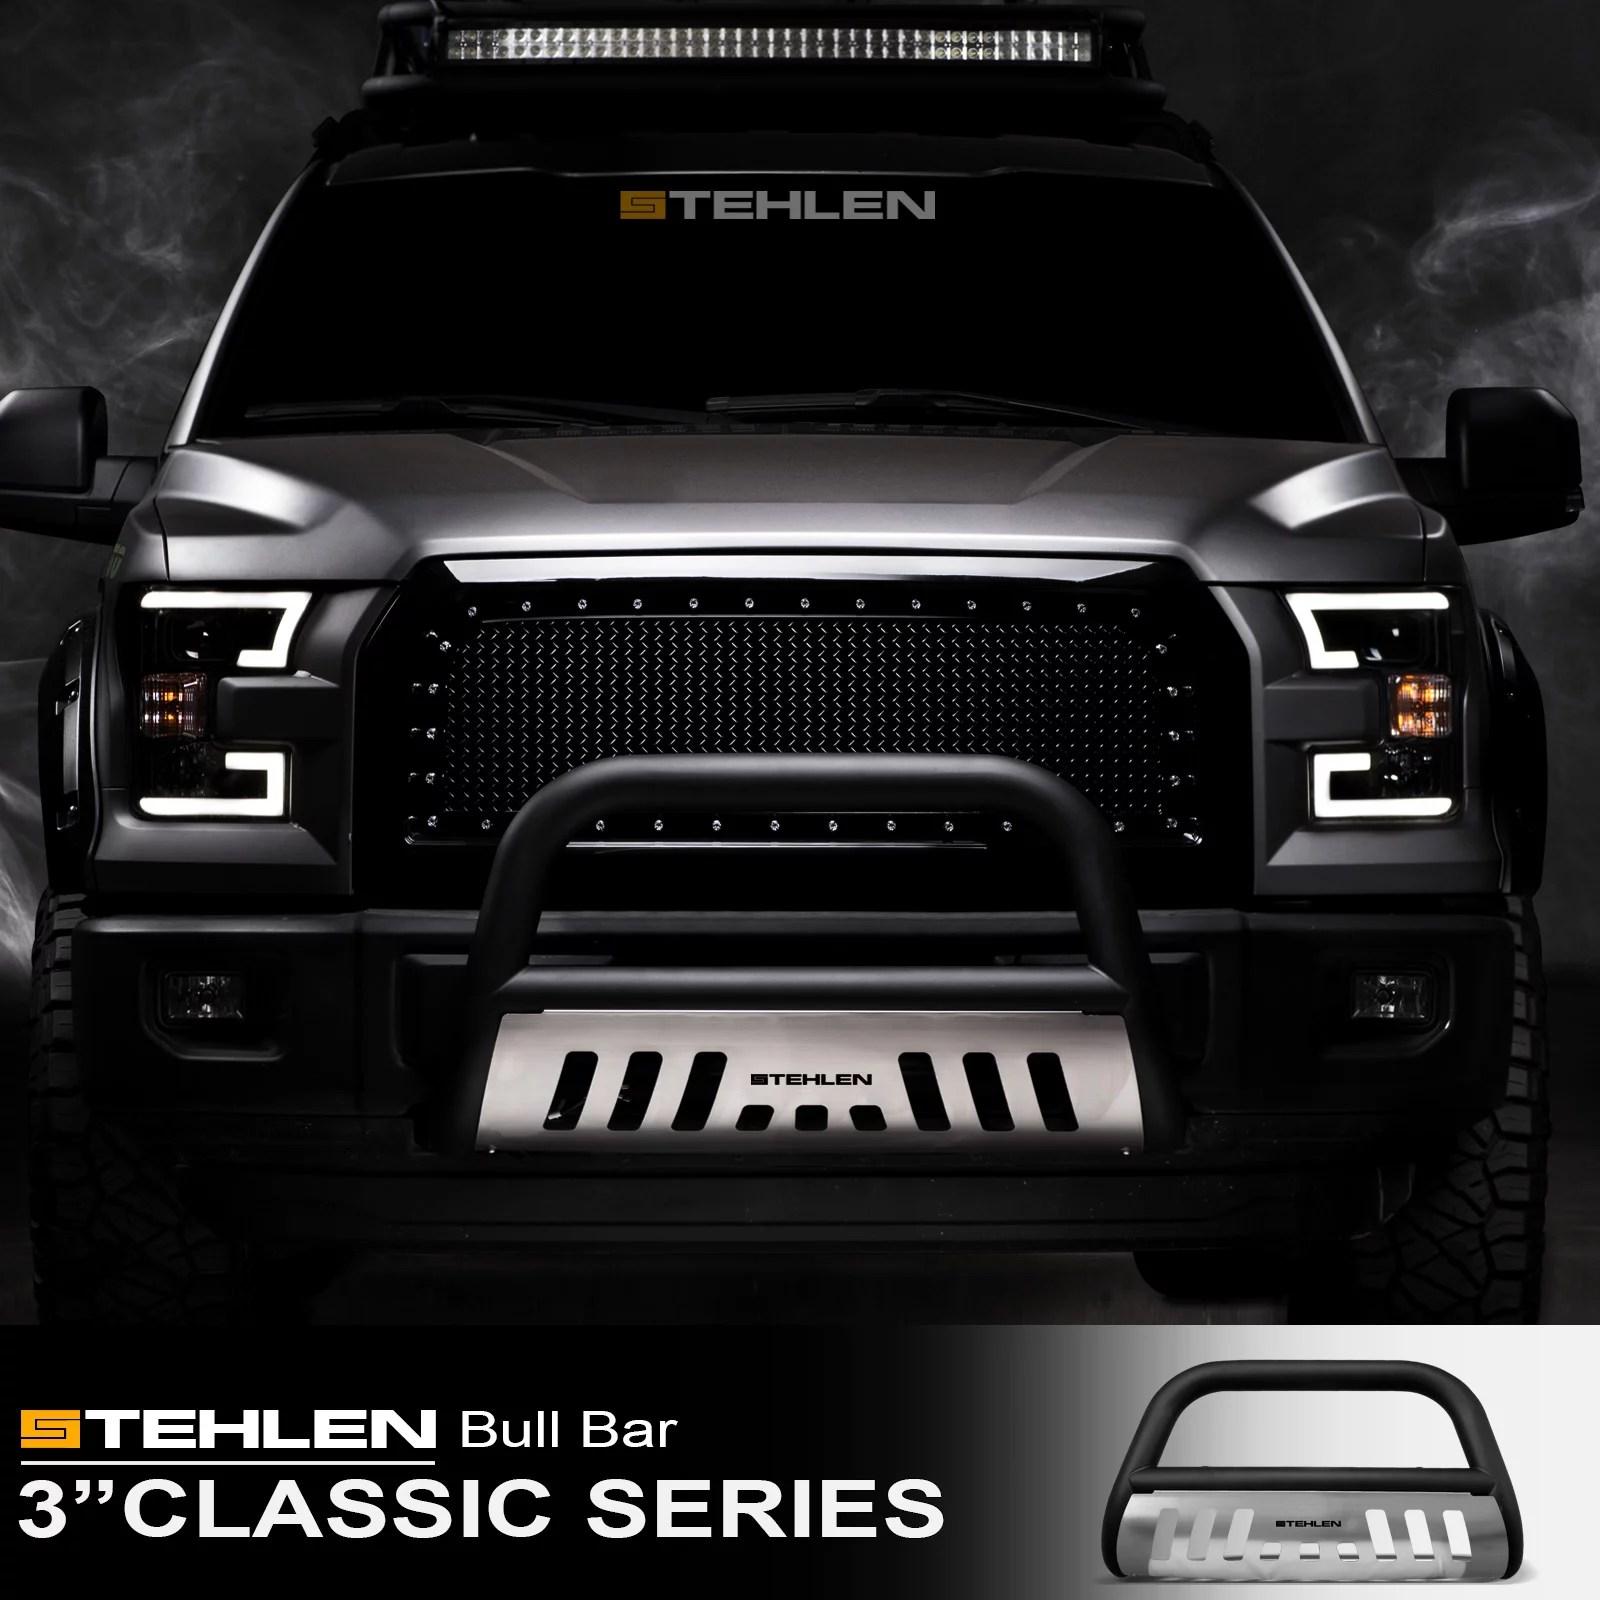 hight resolution of stehlen 714937181861 3 classic series bull bar matte black brush aluminum skid plate for 2005 2007 jeep grand cherokee 2006 2010 commander